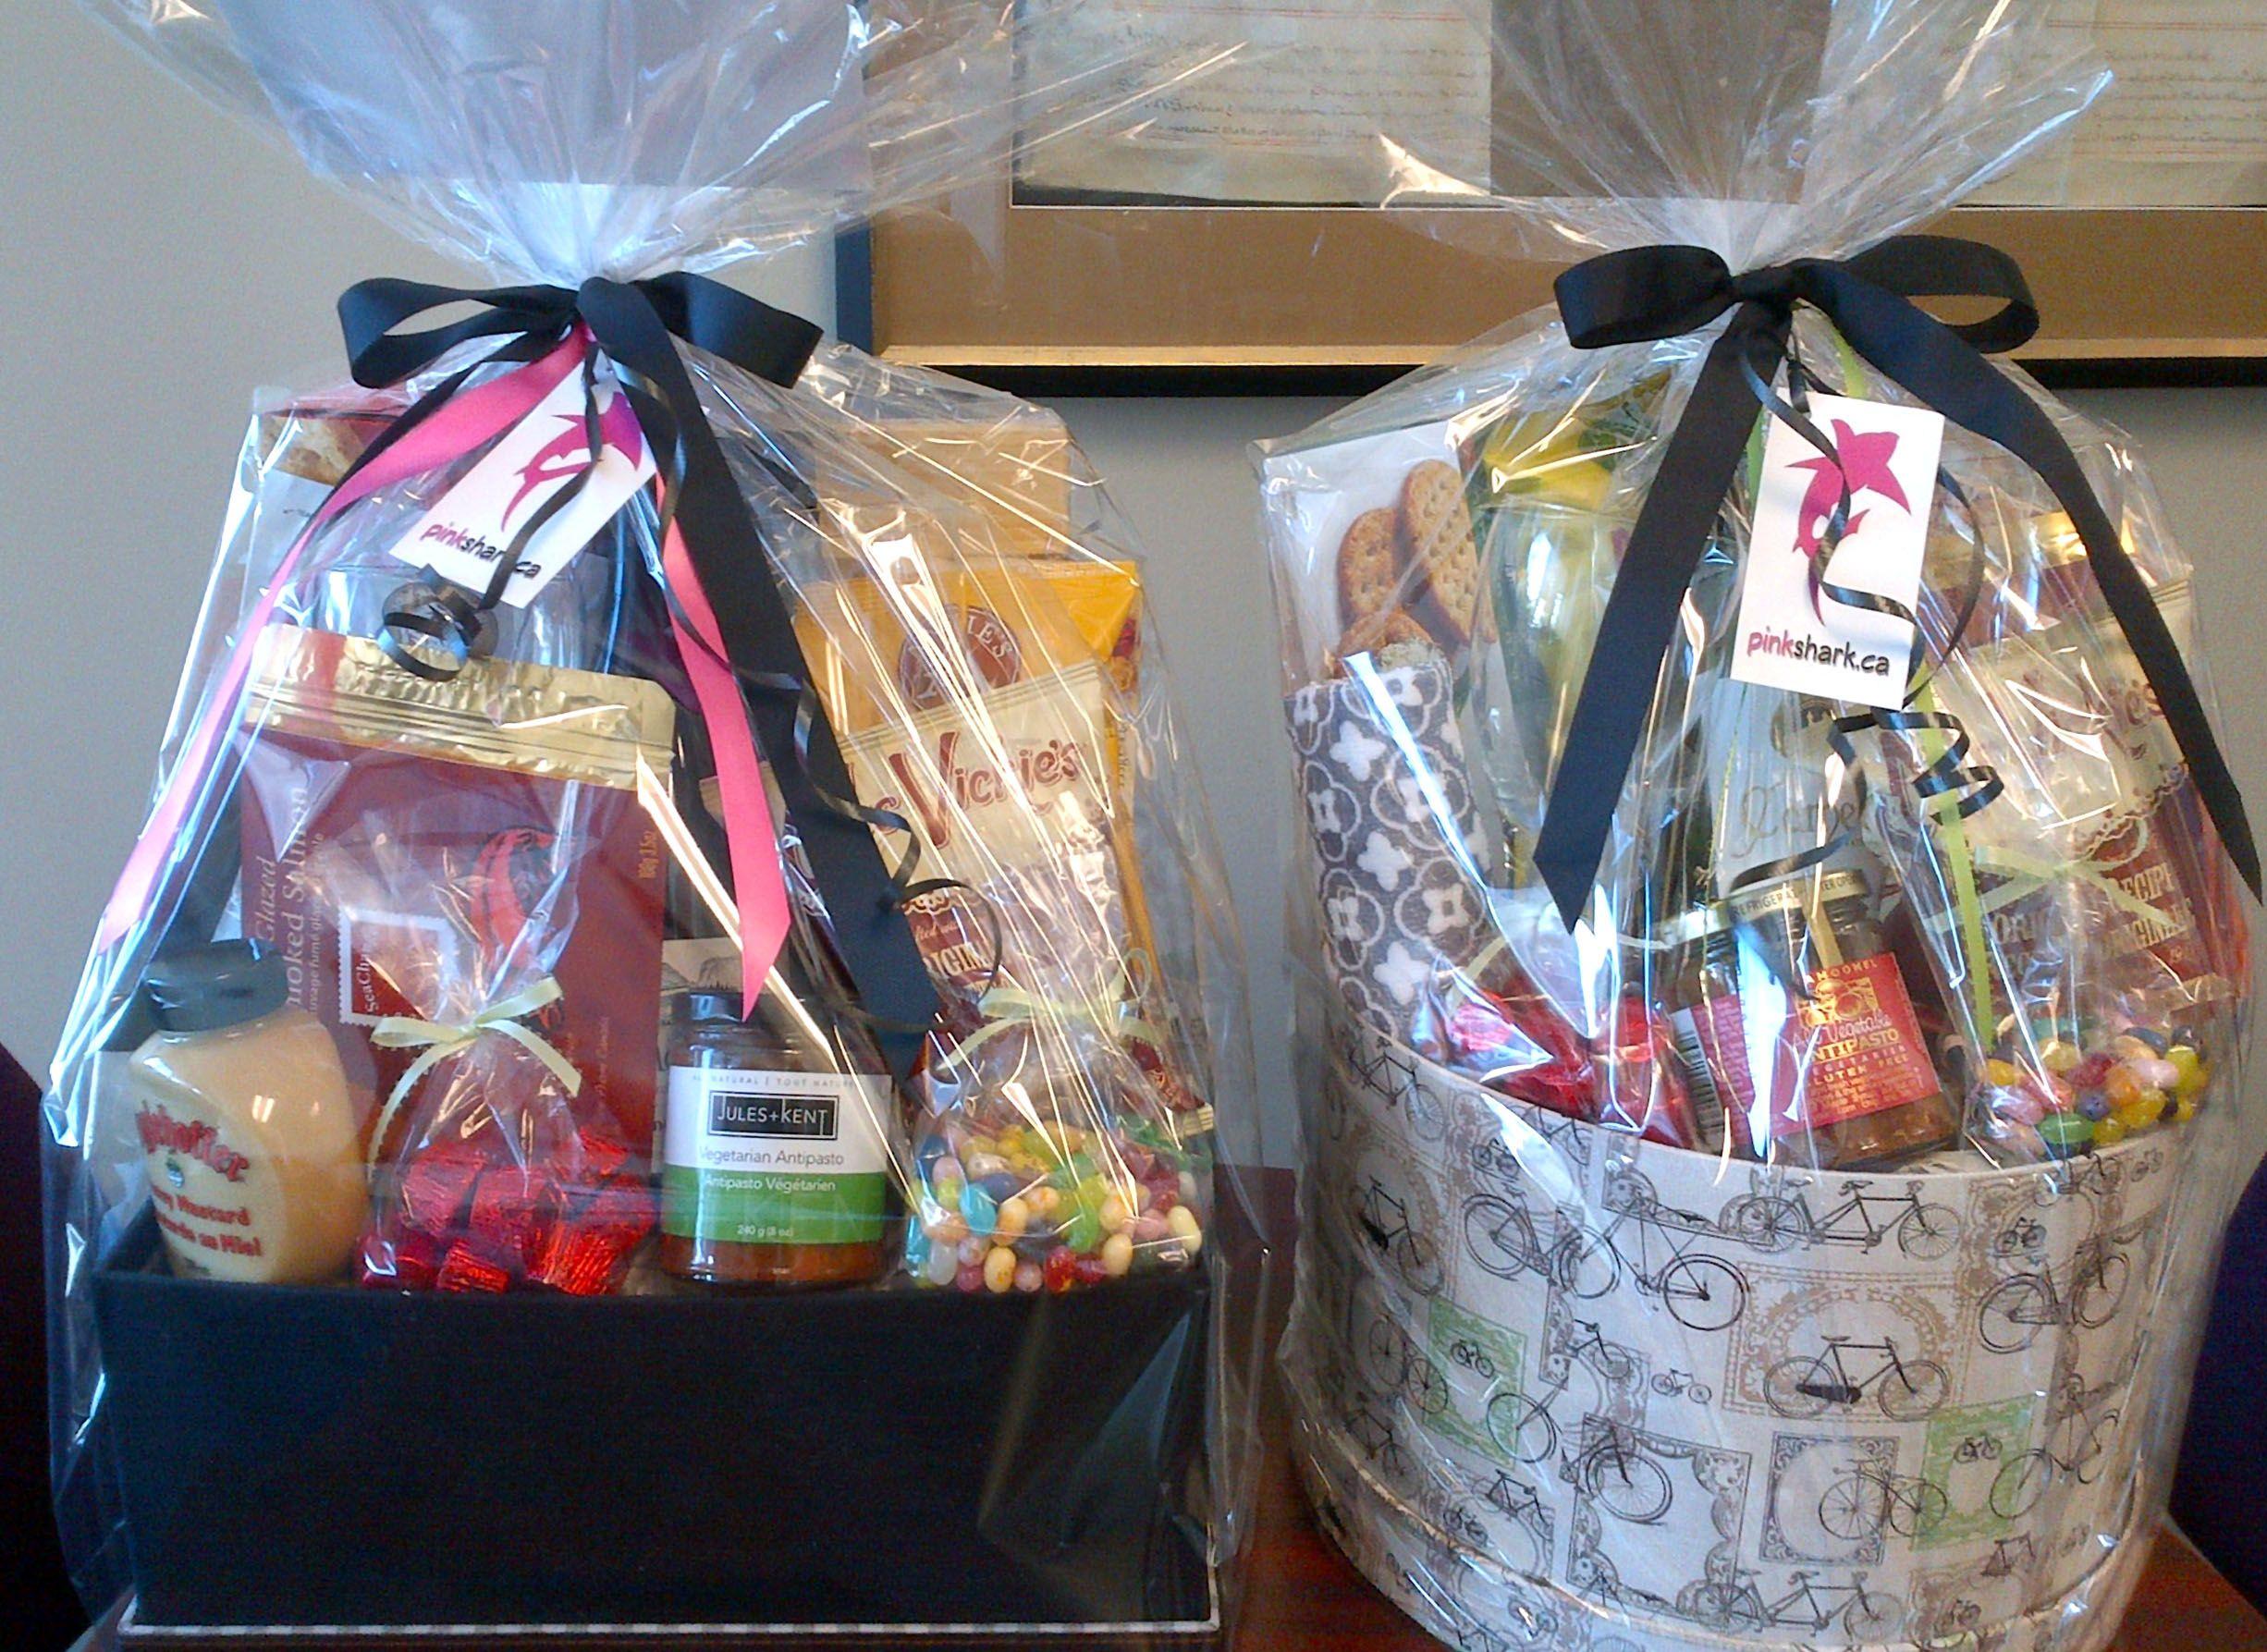 RE/MAX Kelowna client appreciation gift baskets! Real